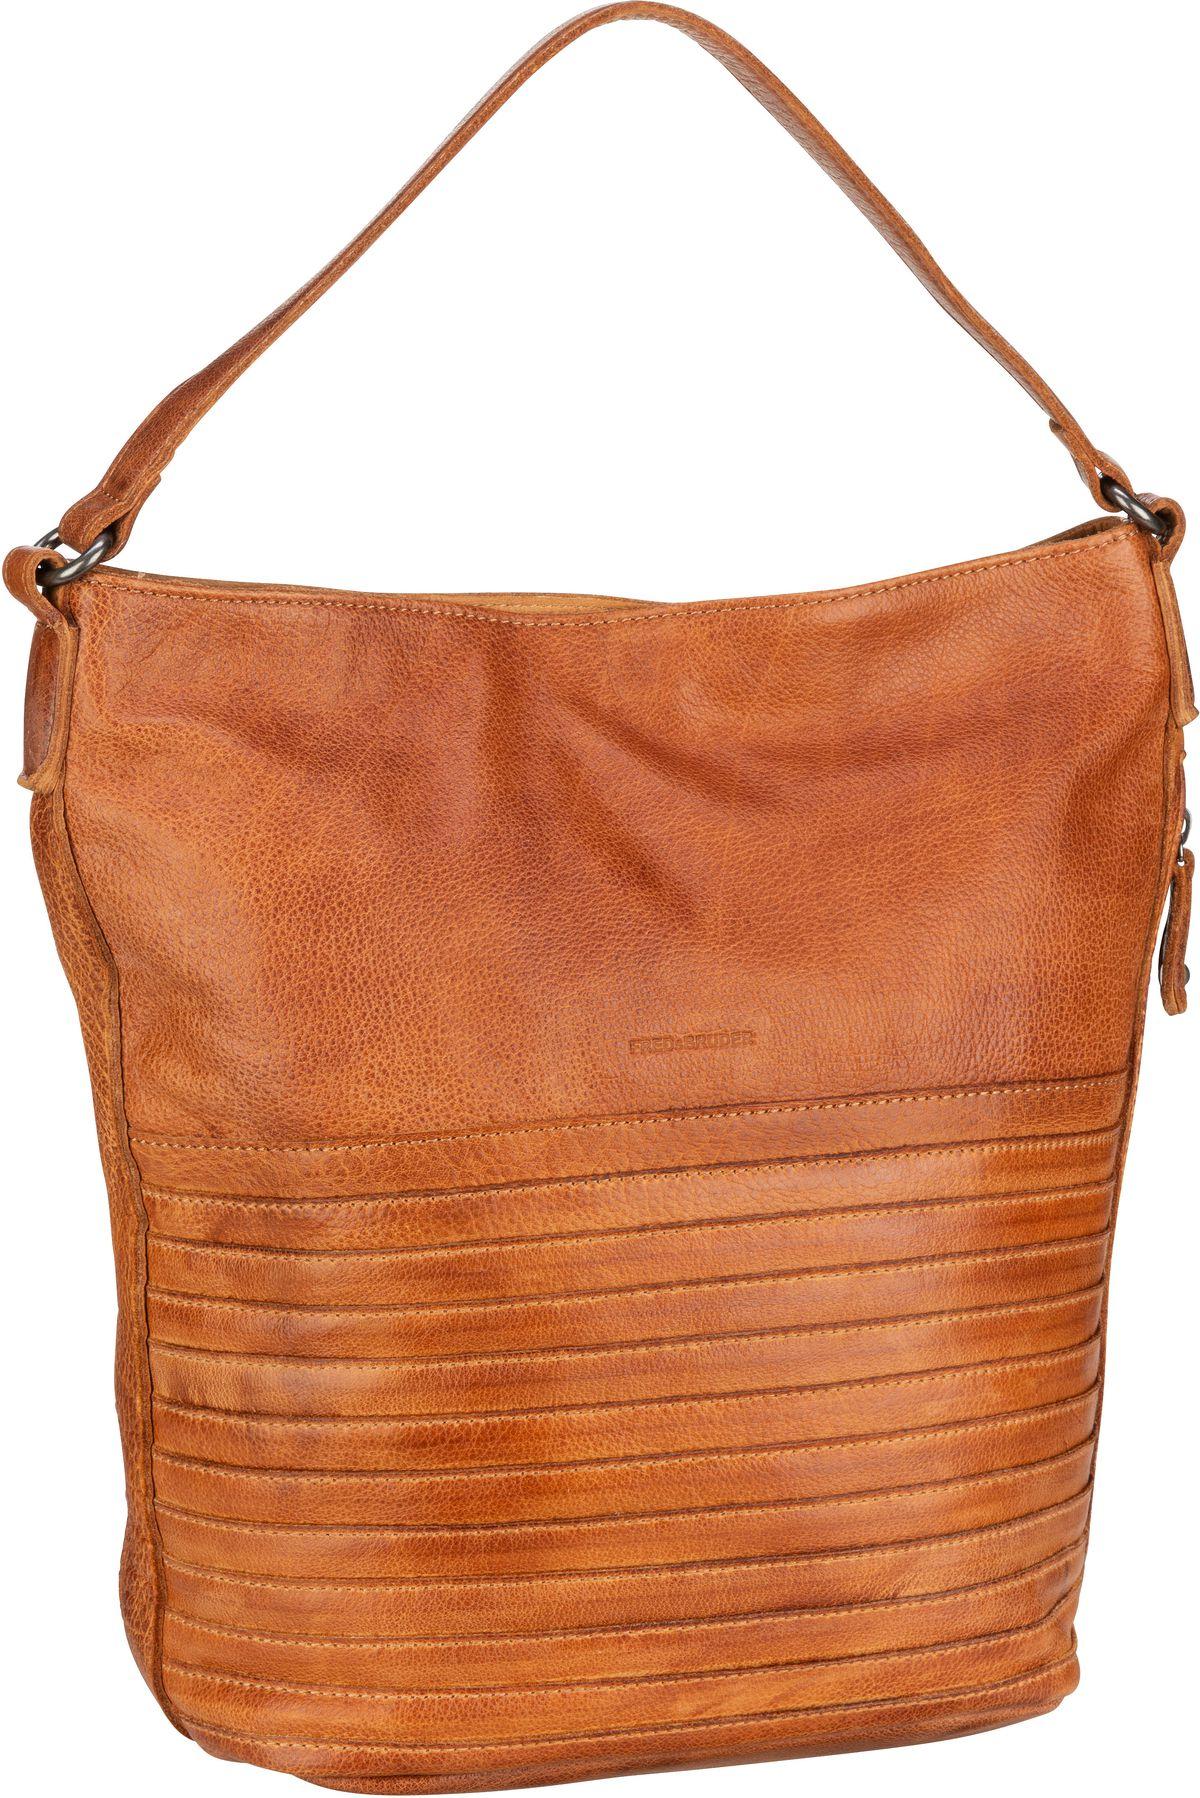 Handtasche Cheri Caramel